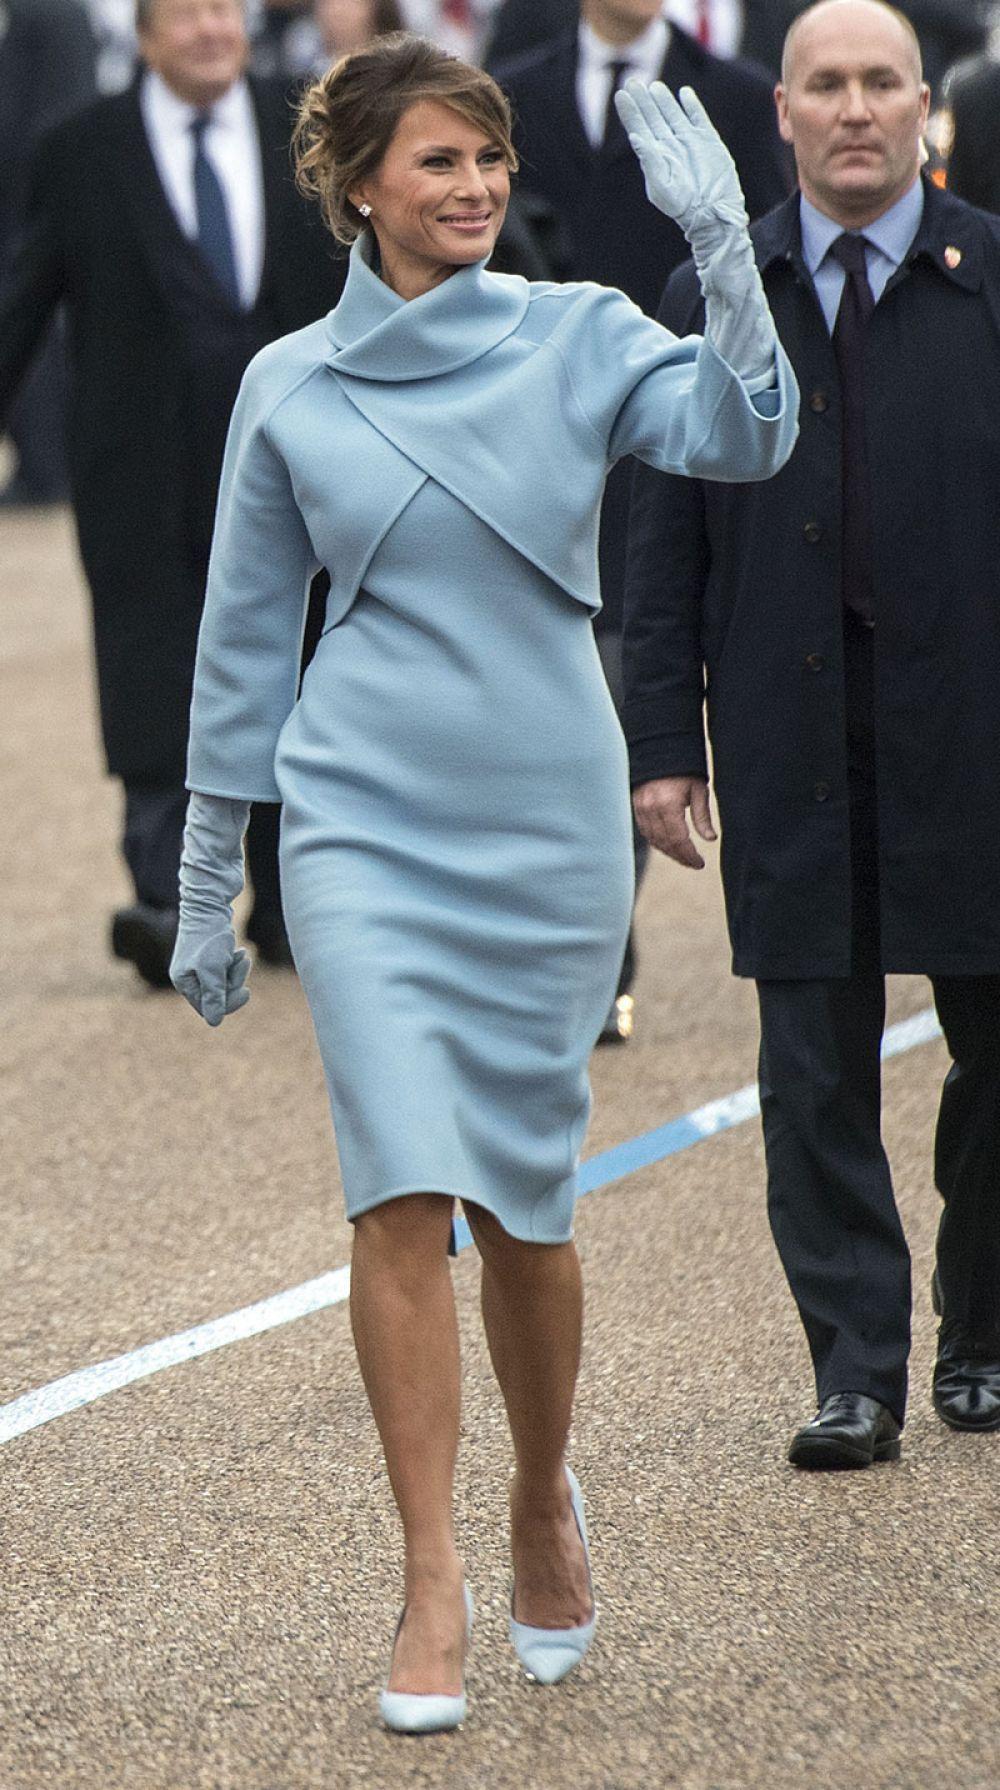 Melania Trump\'s Ralph Lauren suit (2017)   Dressed to Impress ...